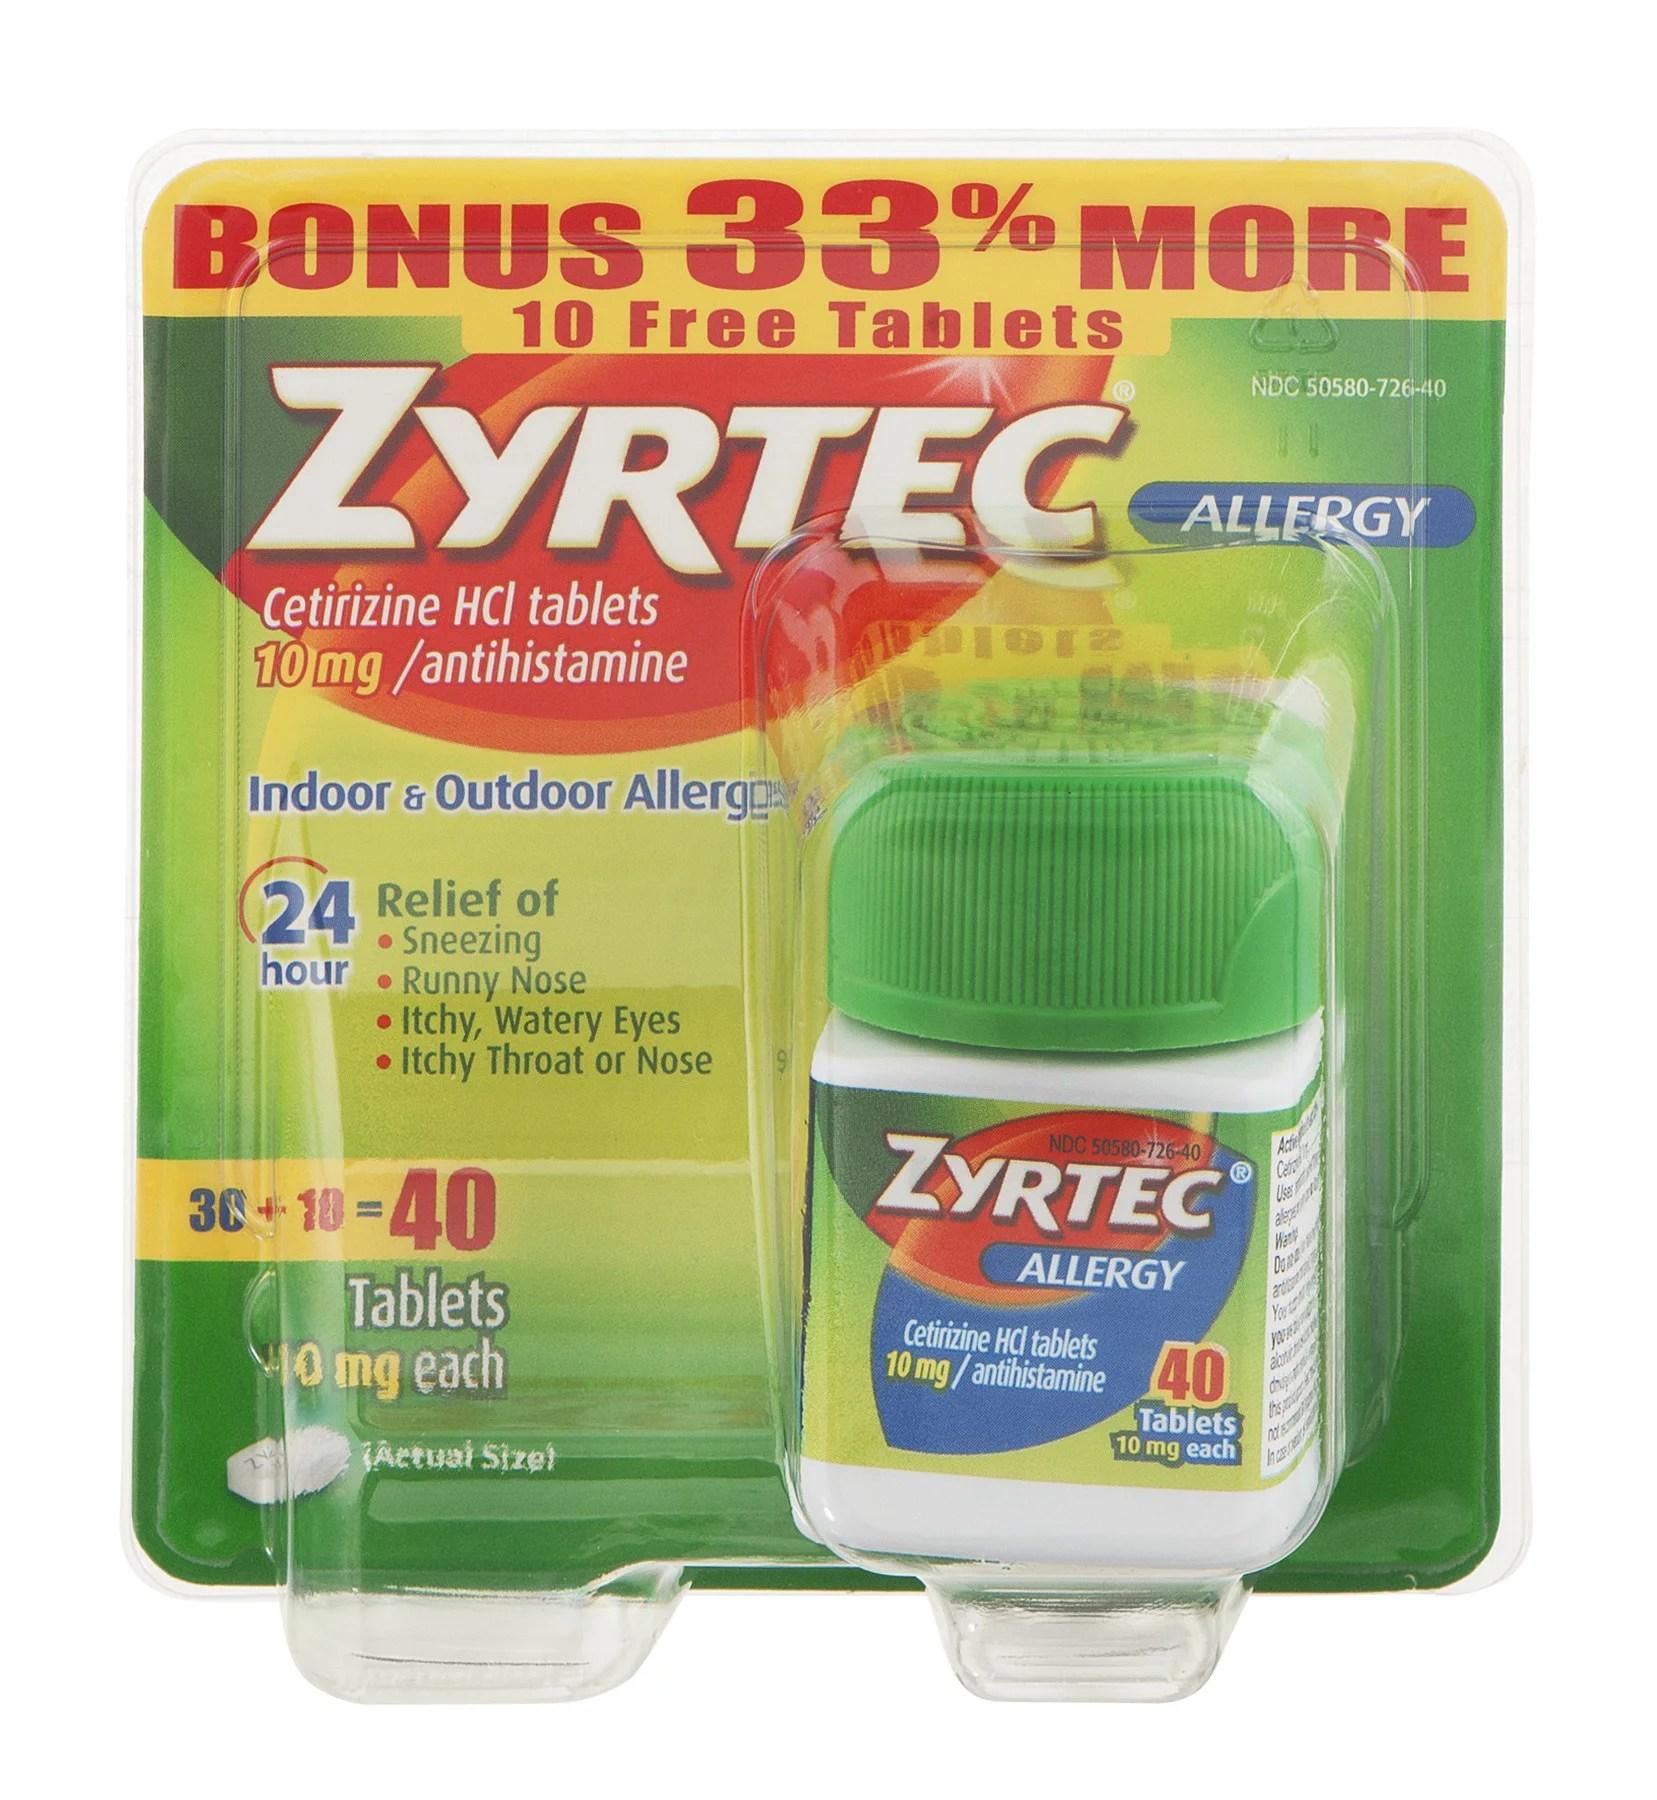 Zyrtec 24 Hour Allergy Relief Tablets 40 Ct - Walmart.com ...